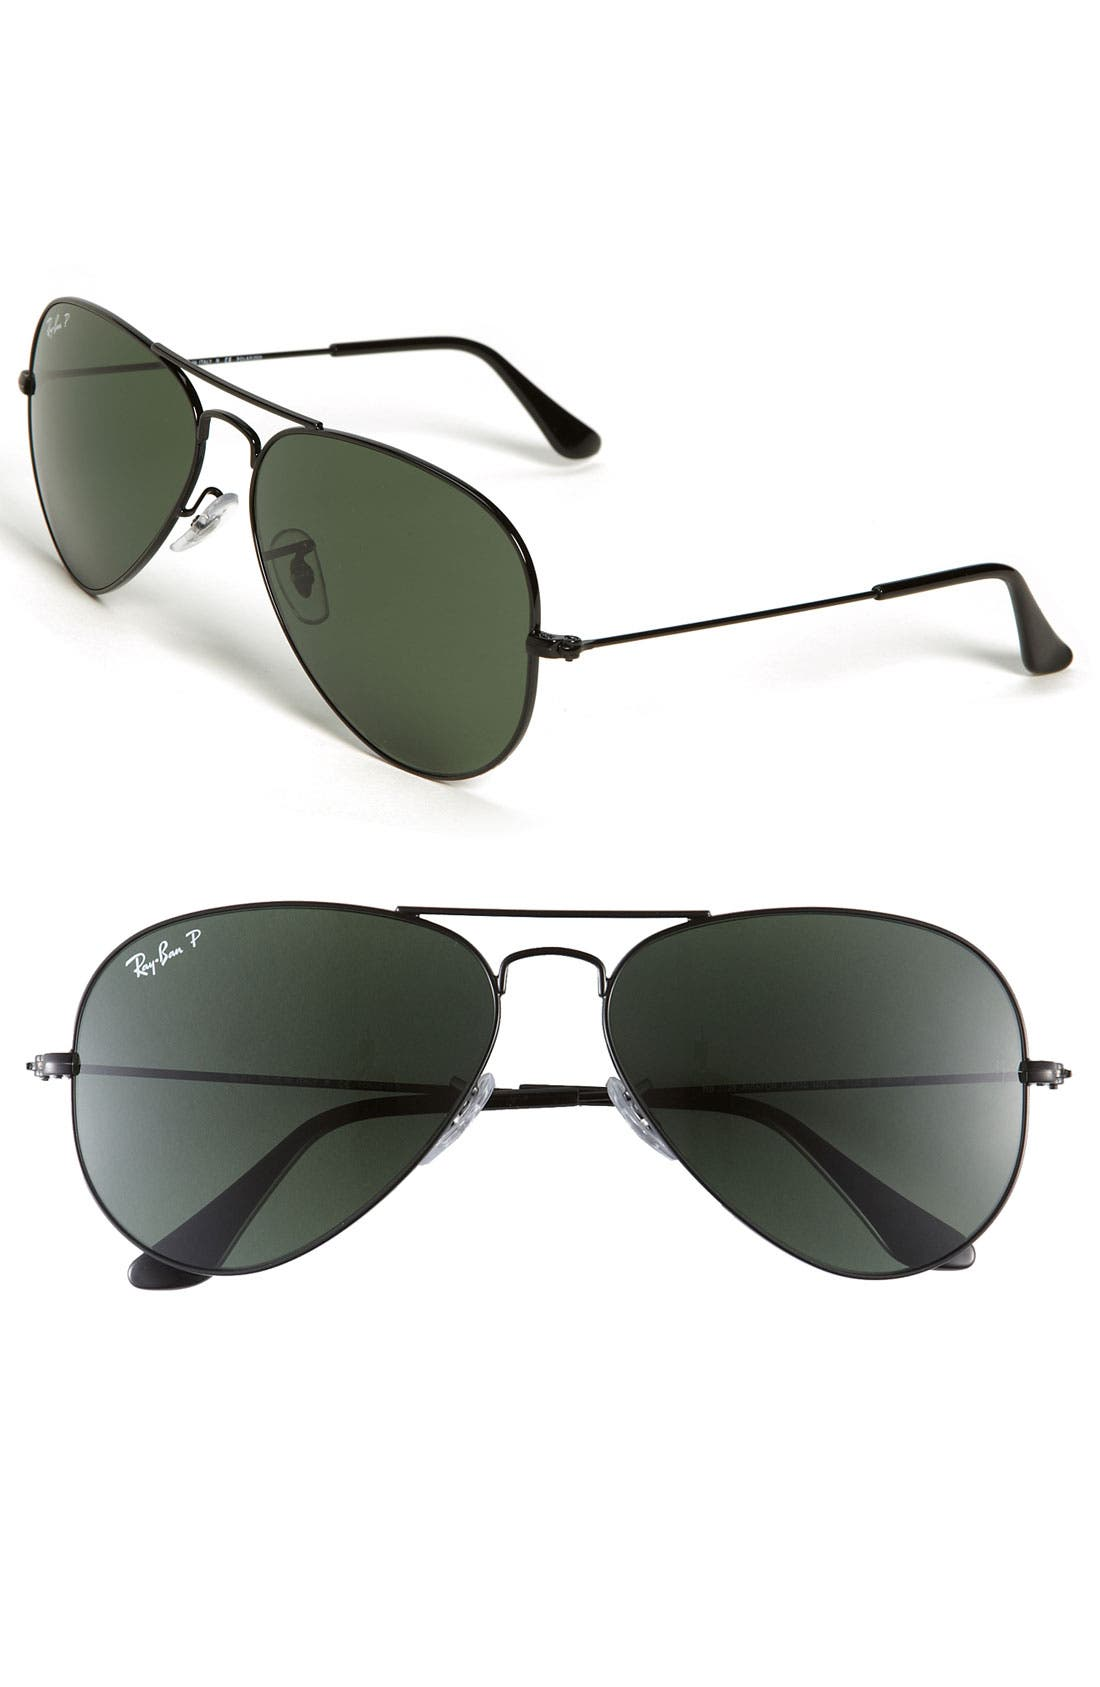 ray ban original aviator 58mm sunglasses